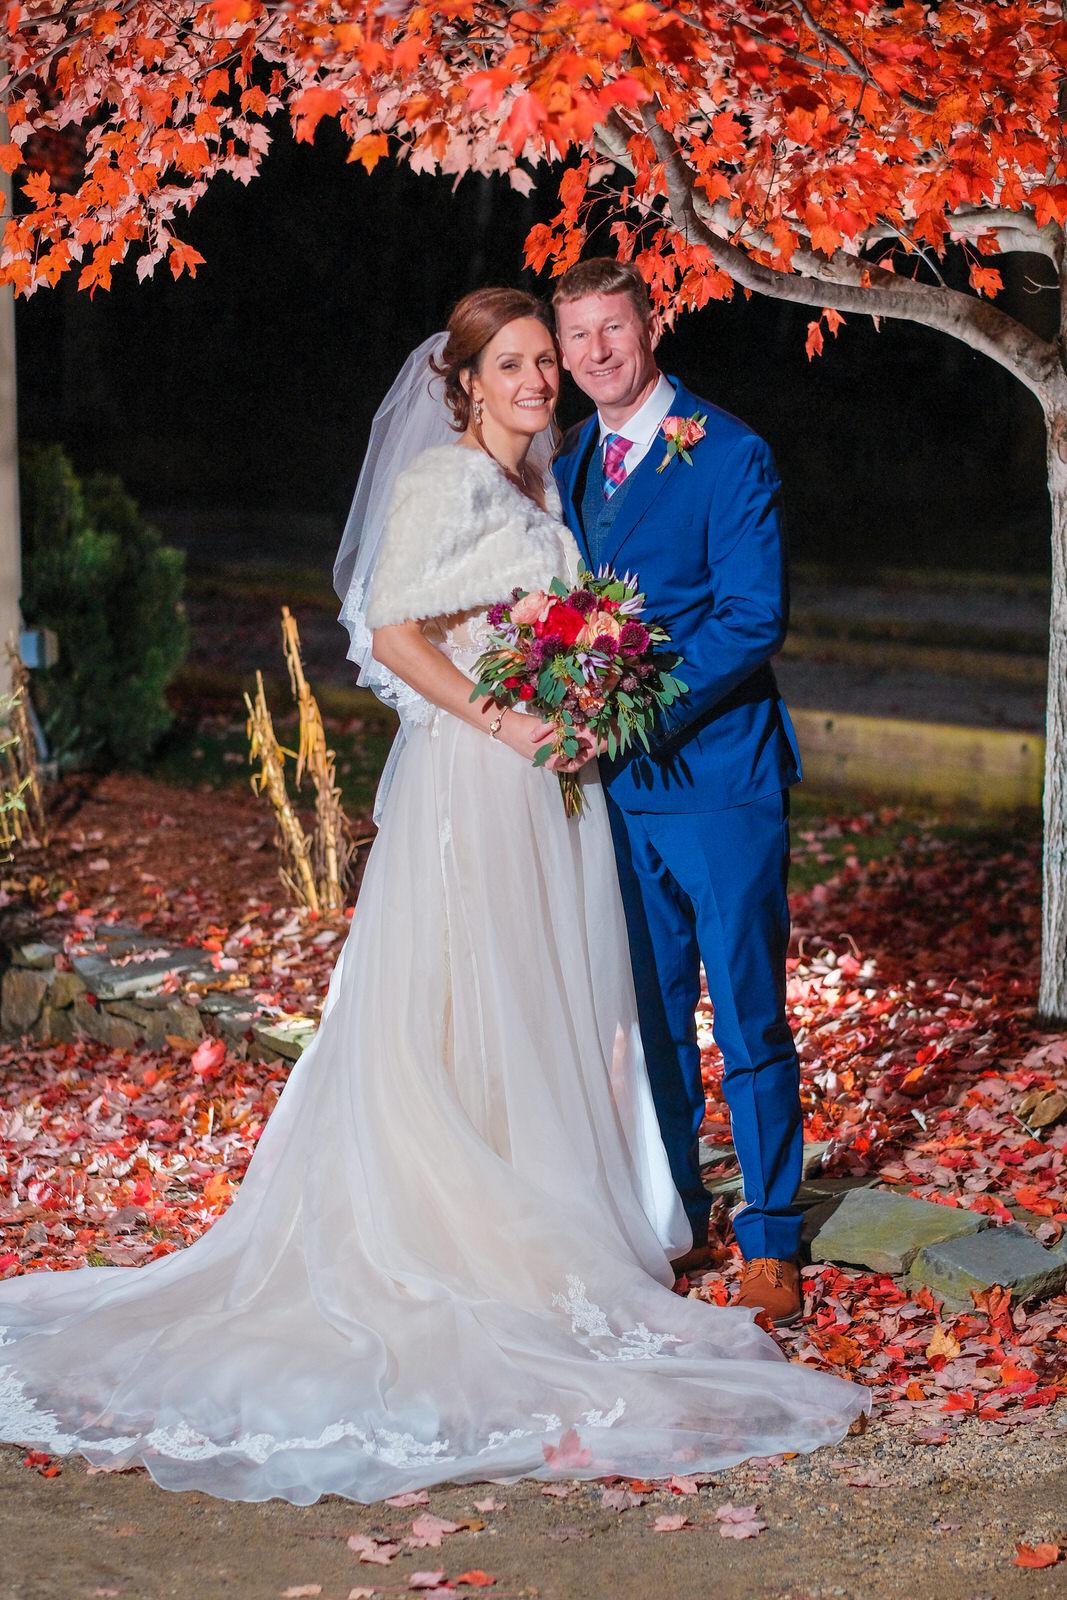 Zorvino-Vineyards-Fall-Wedding-Photography-560.jpg